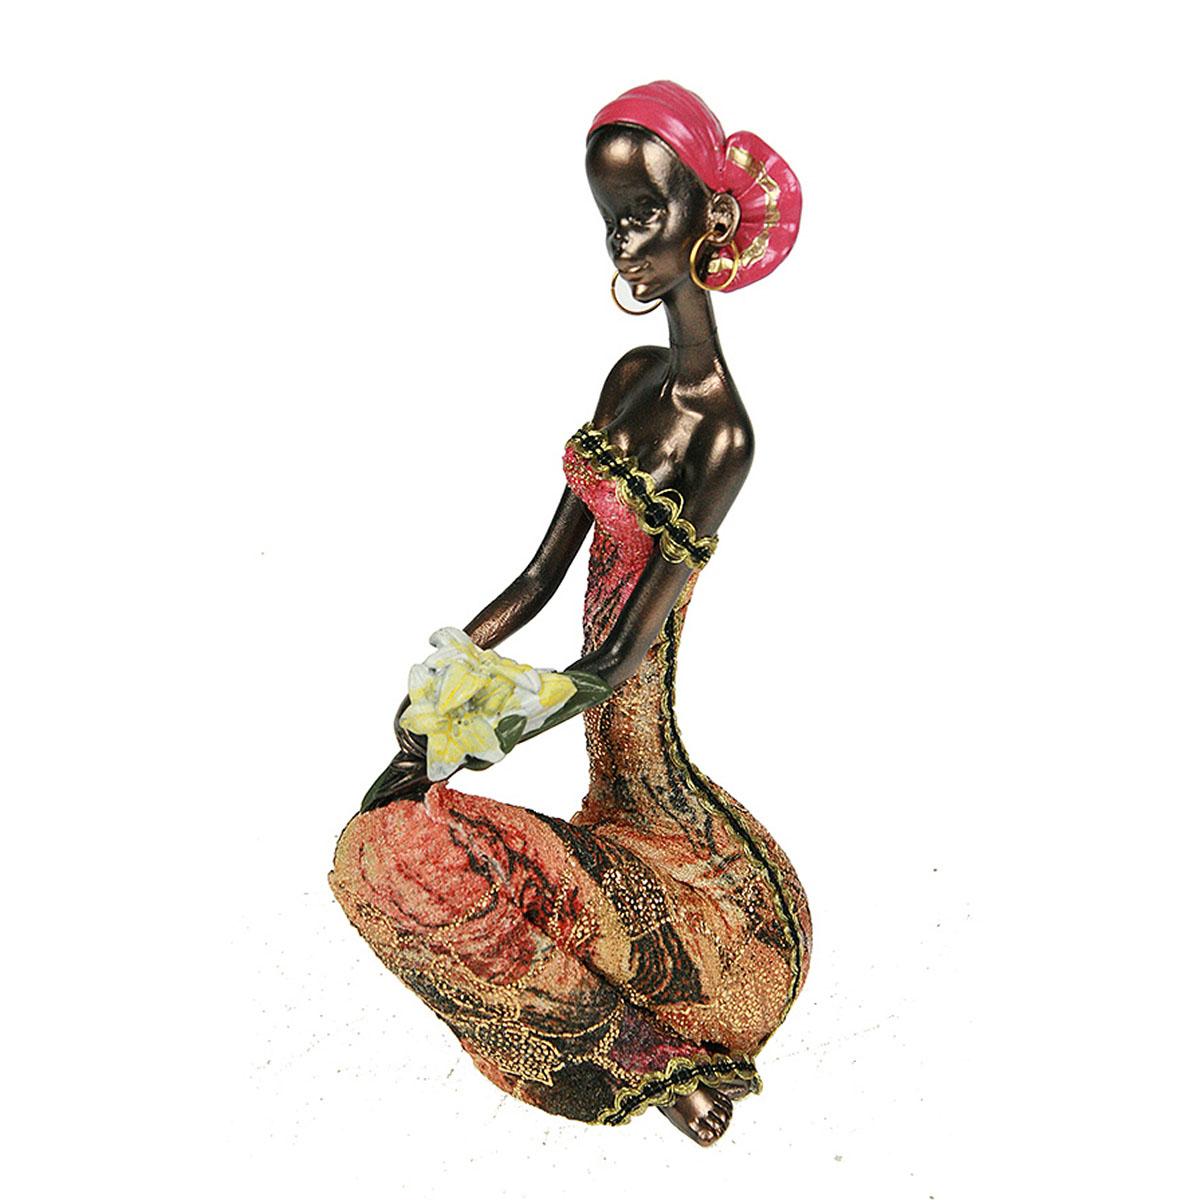 Статуэтка Русские Подарки Африканка, 7 х 9 х 18 см статуэтка lefard африканка 174 311